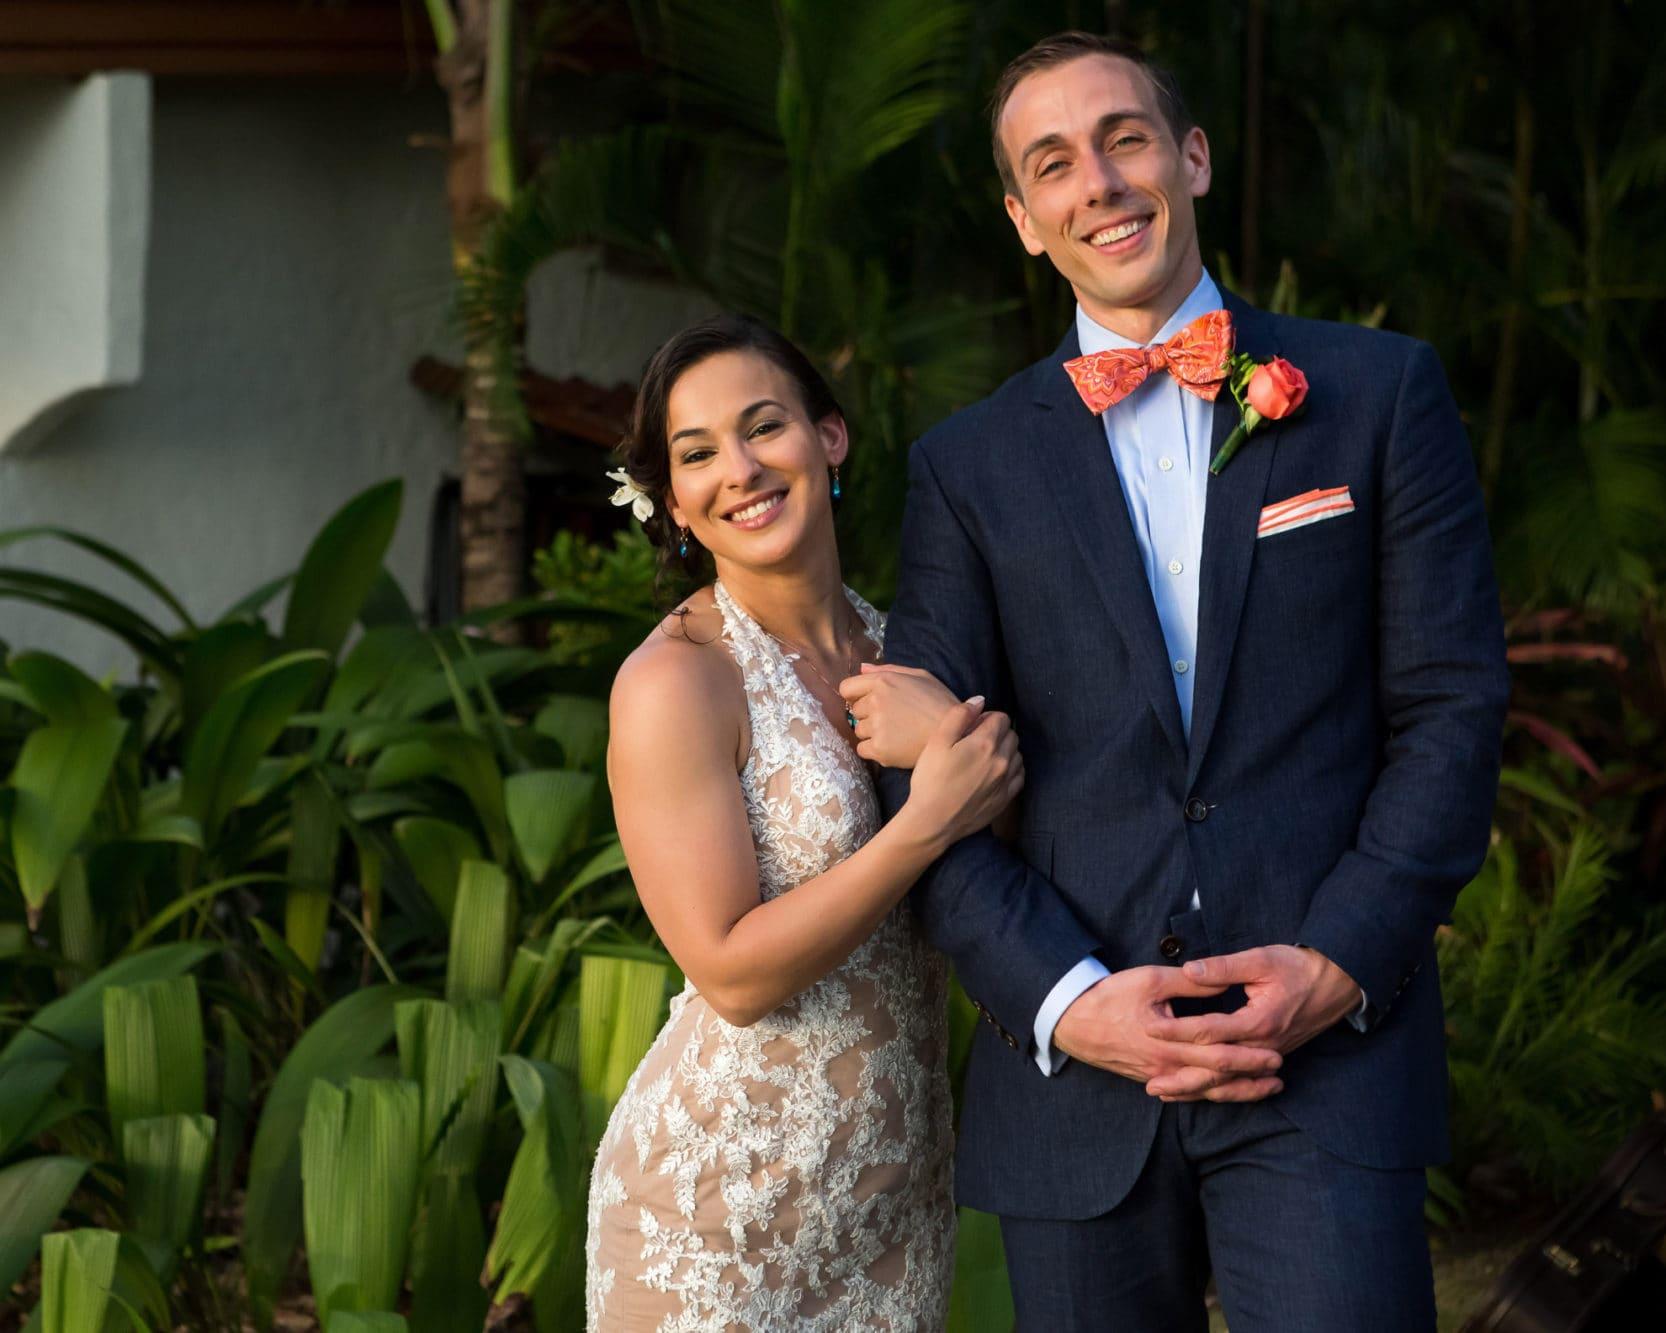 Bride and Groom in Costa Rica before their garden wedding.